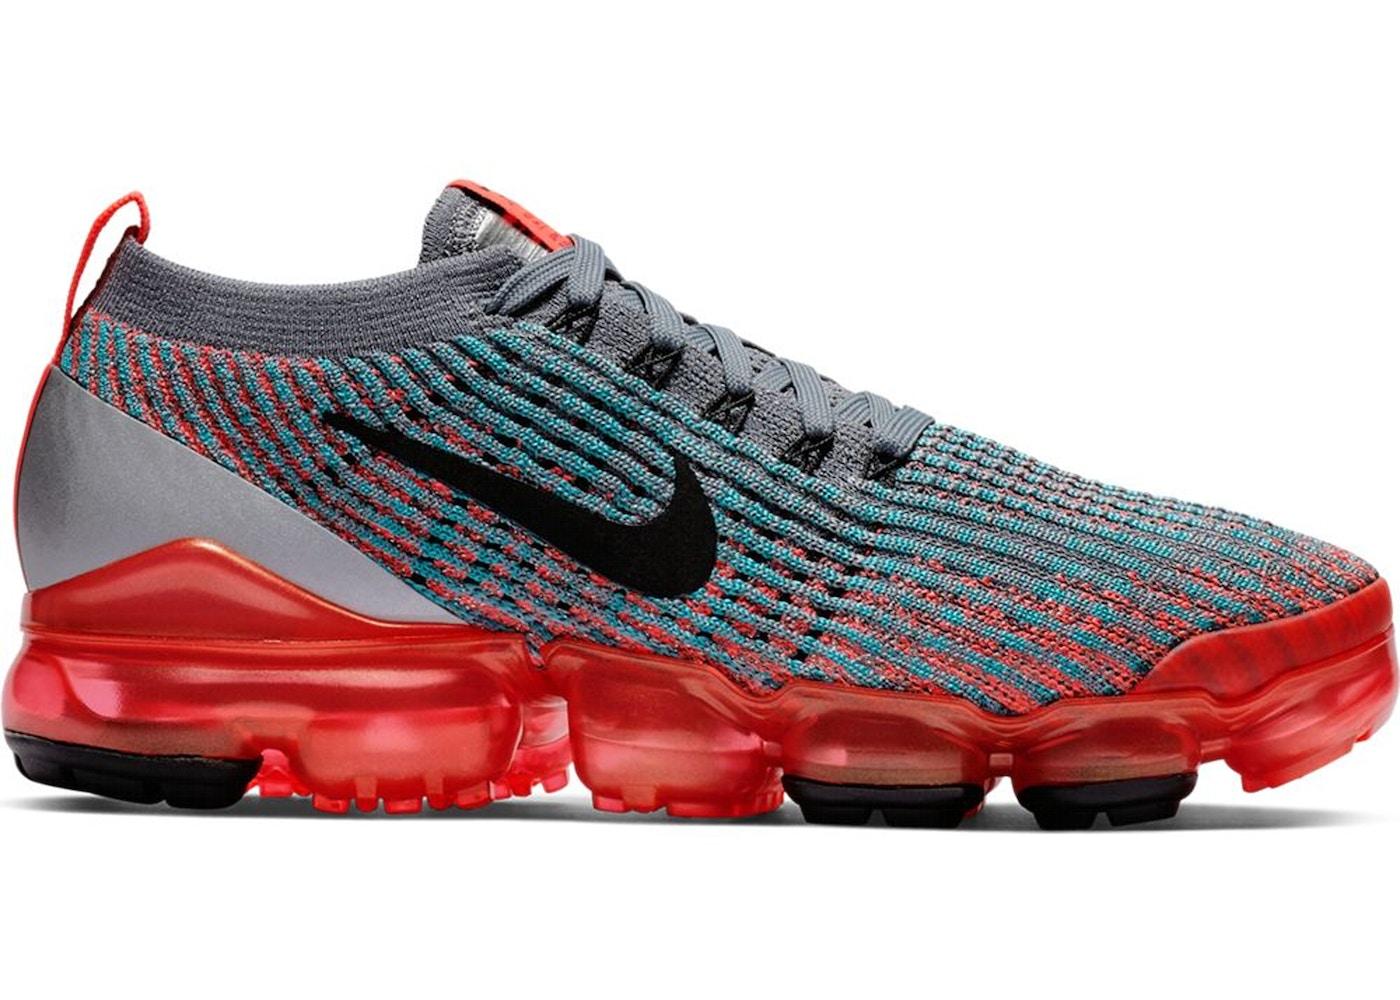 bd2fd0cc0cd Nike Air Max VaporMax Shoes - Release Date